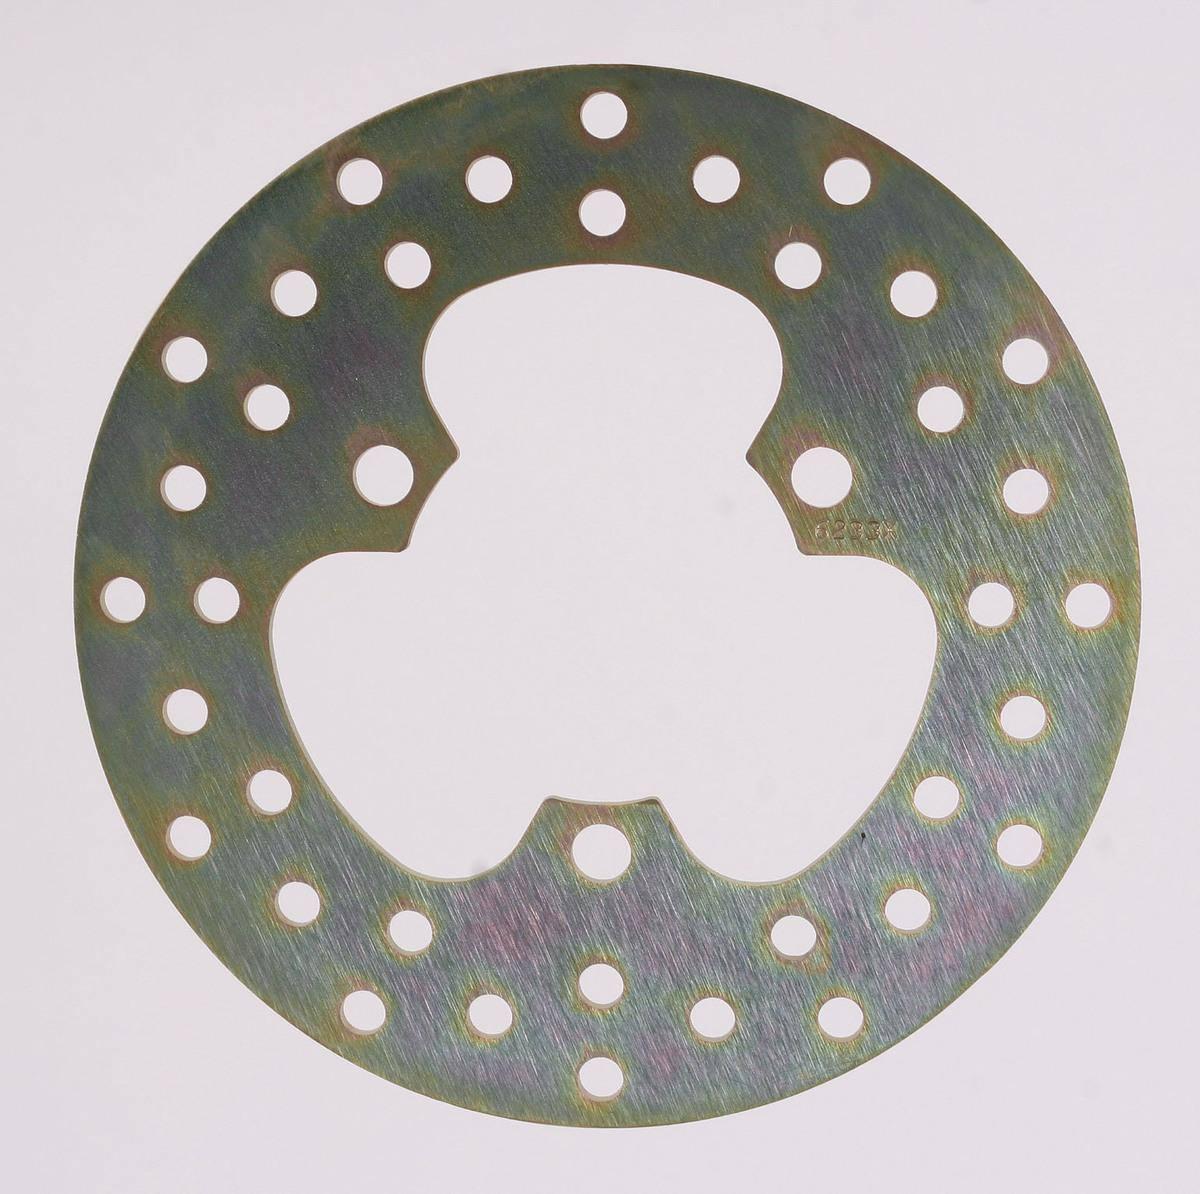 OE Replacement Brake Rotor